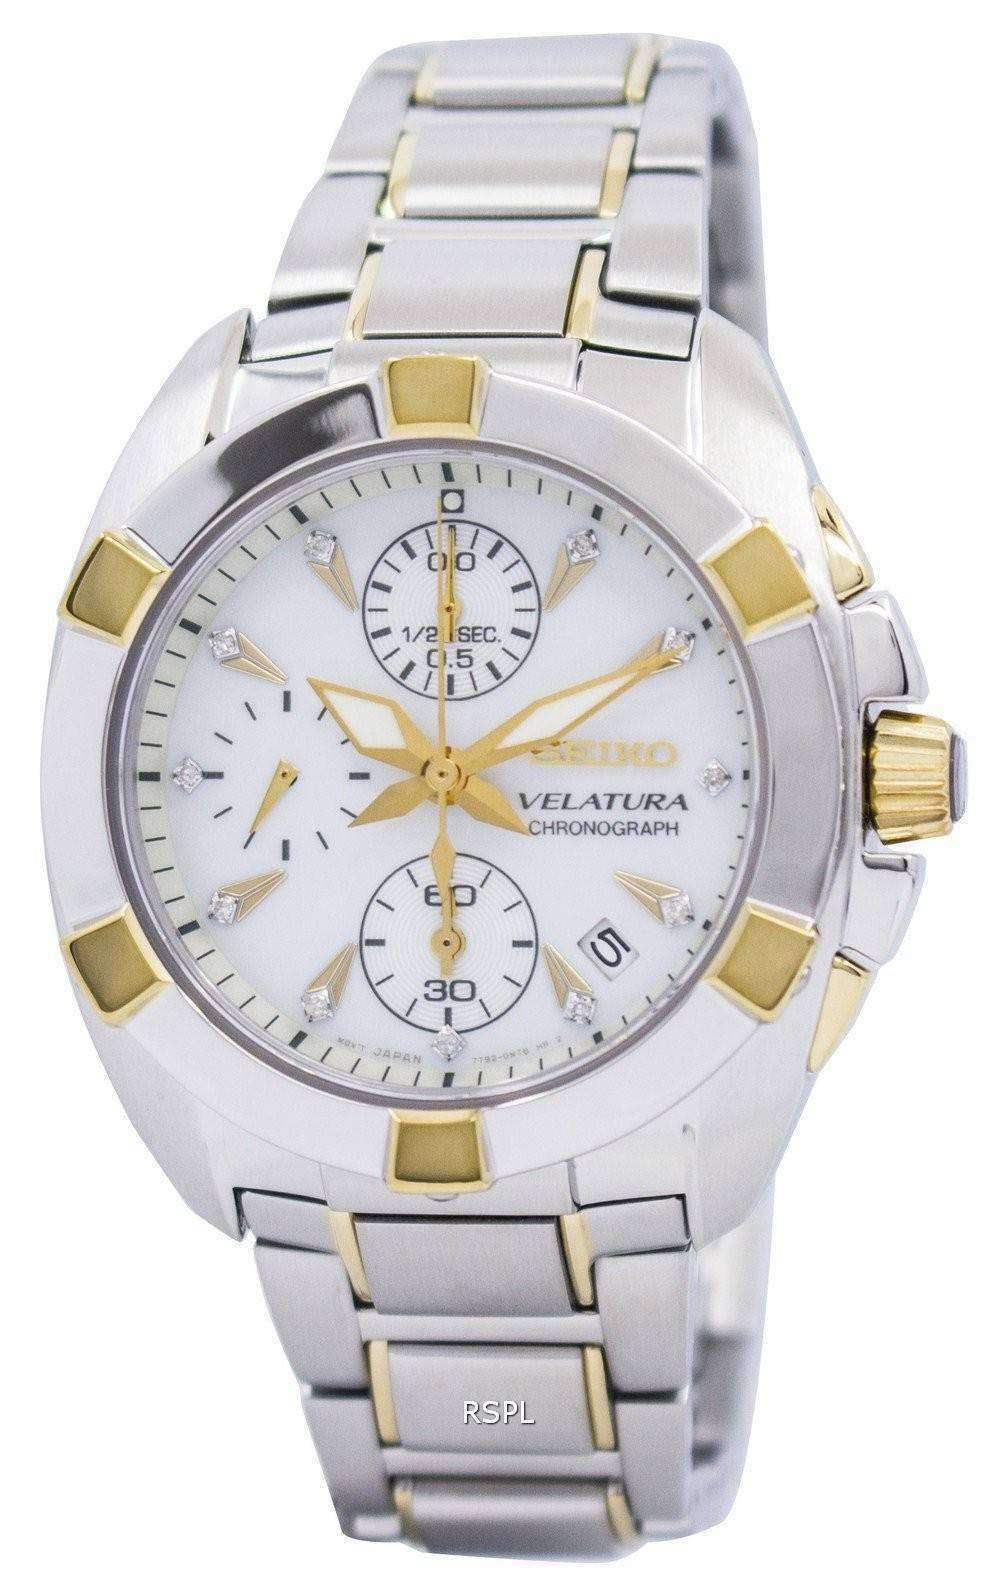 85885581d0a0 Seiko Velatura Chronograph SNDZ40 SNDZ40P1 SNDZ40P Ladies Diamonds  Collection Watch